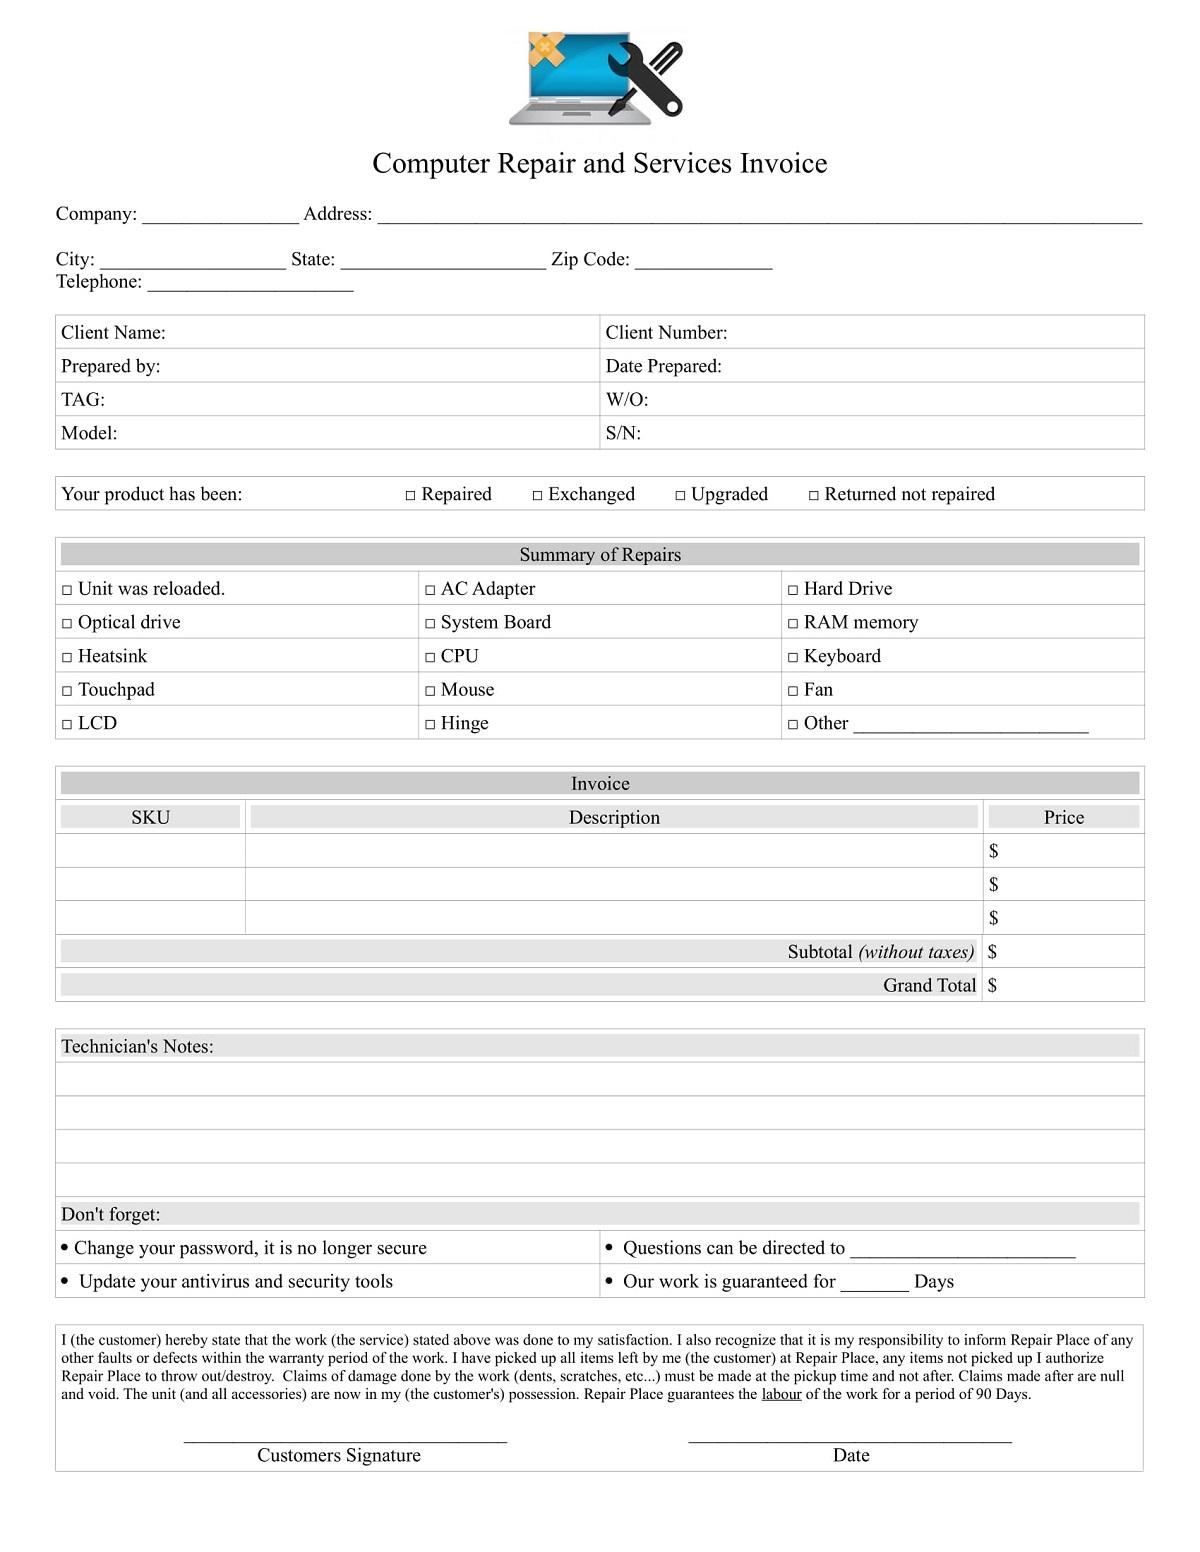 Computer Repair Service Invoice Word Doc Format